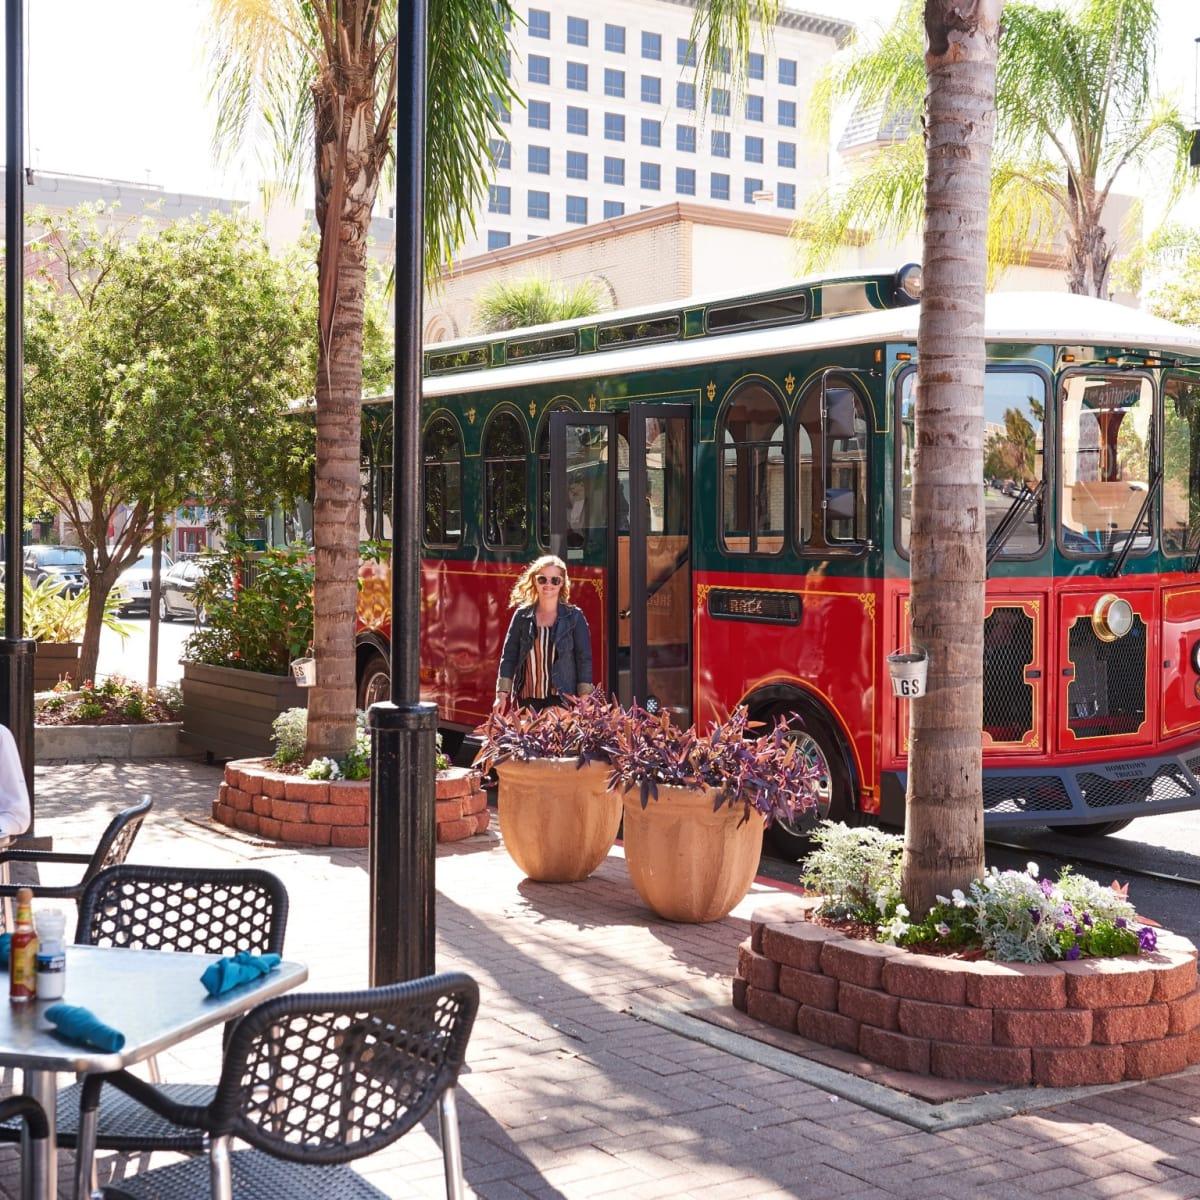 Trolley on Post Office Street in Galveston